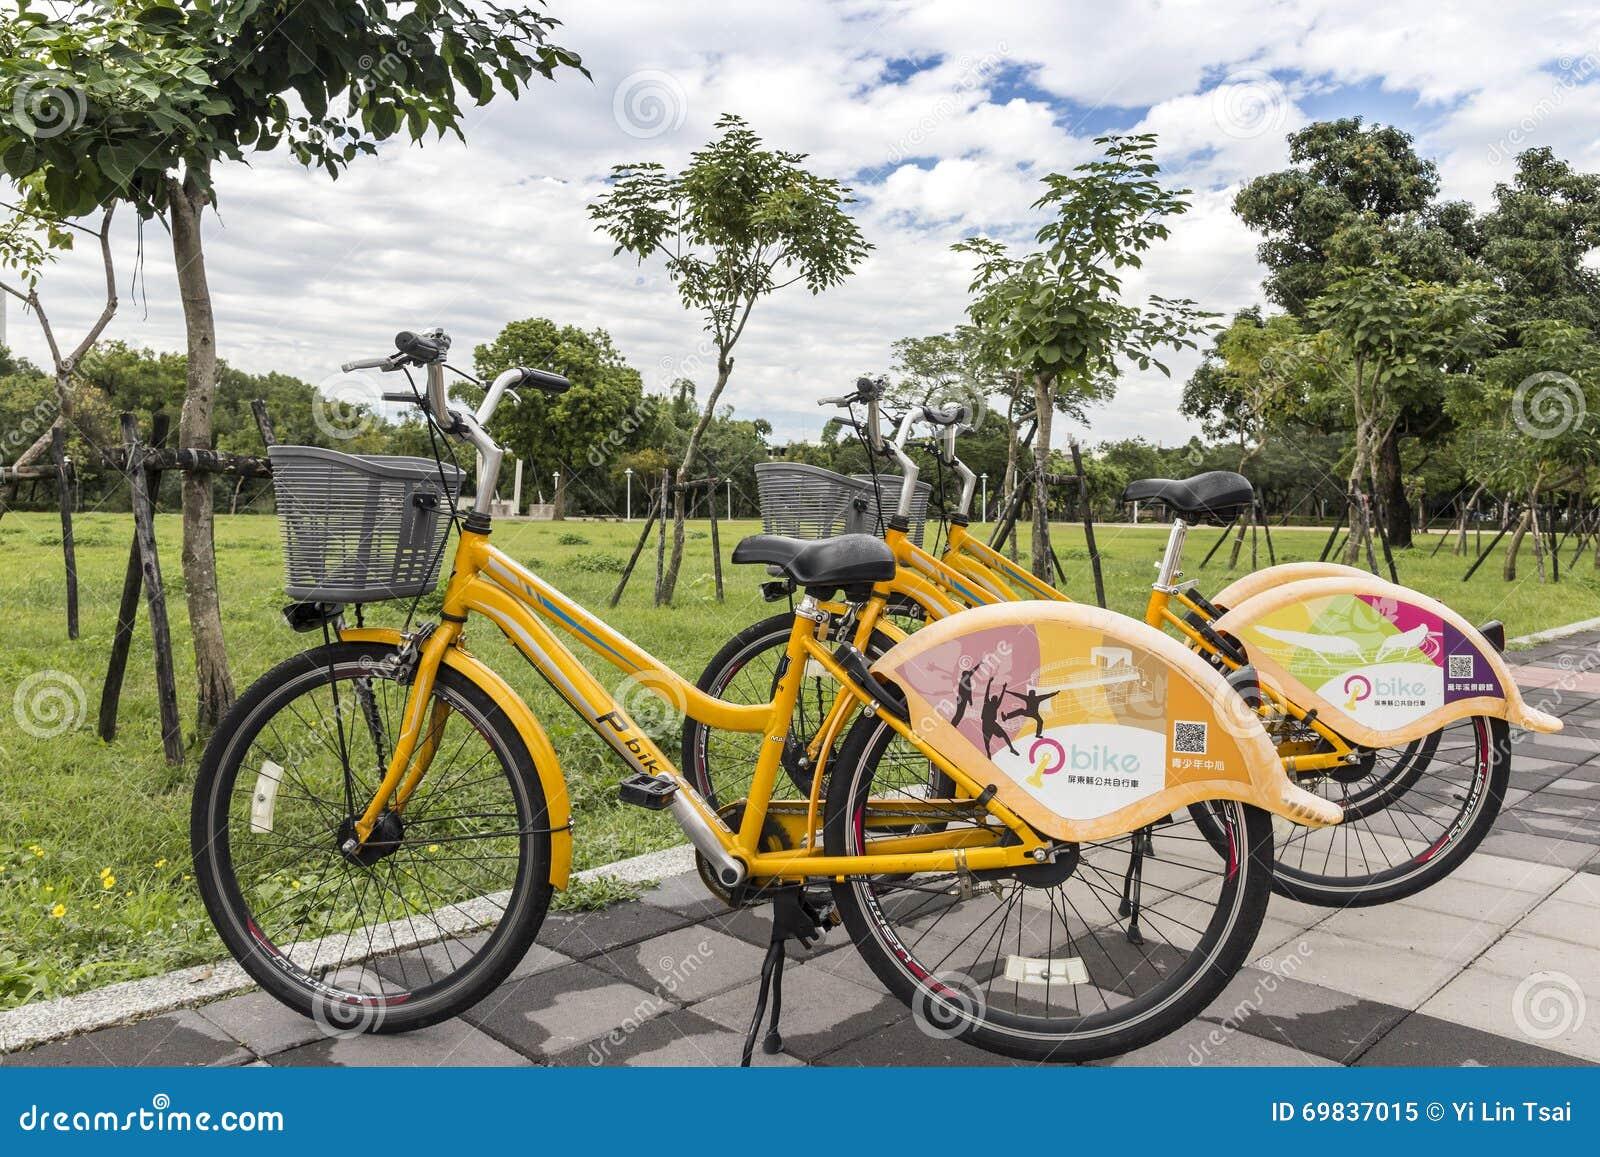 Pbike, ένα δημόσιο σύστημα ενοικίου ποδηλάτων σε Pingtung